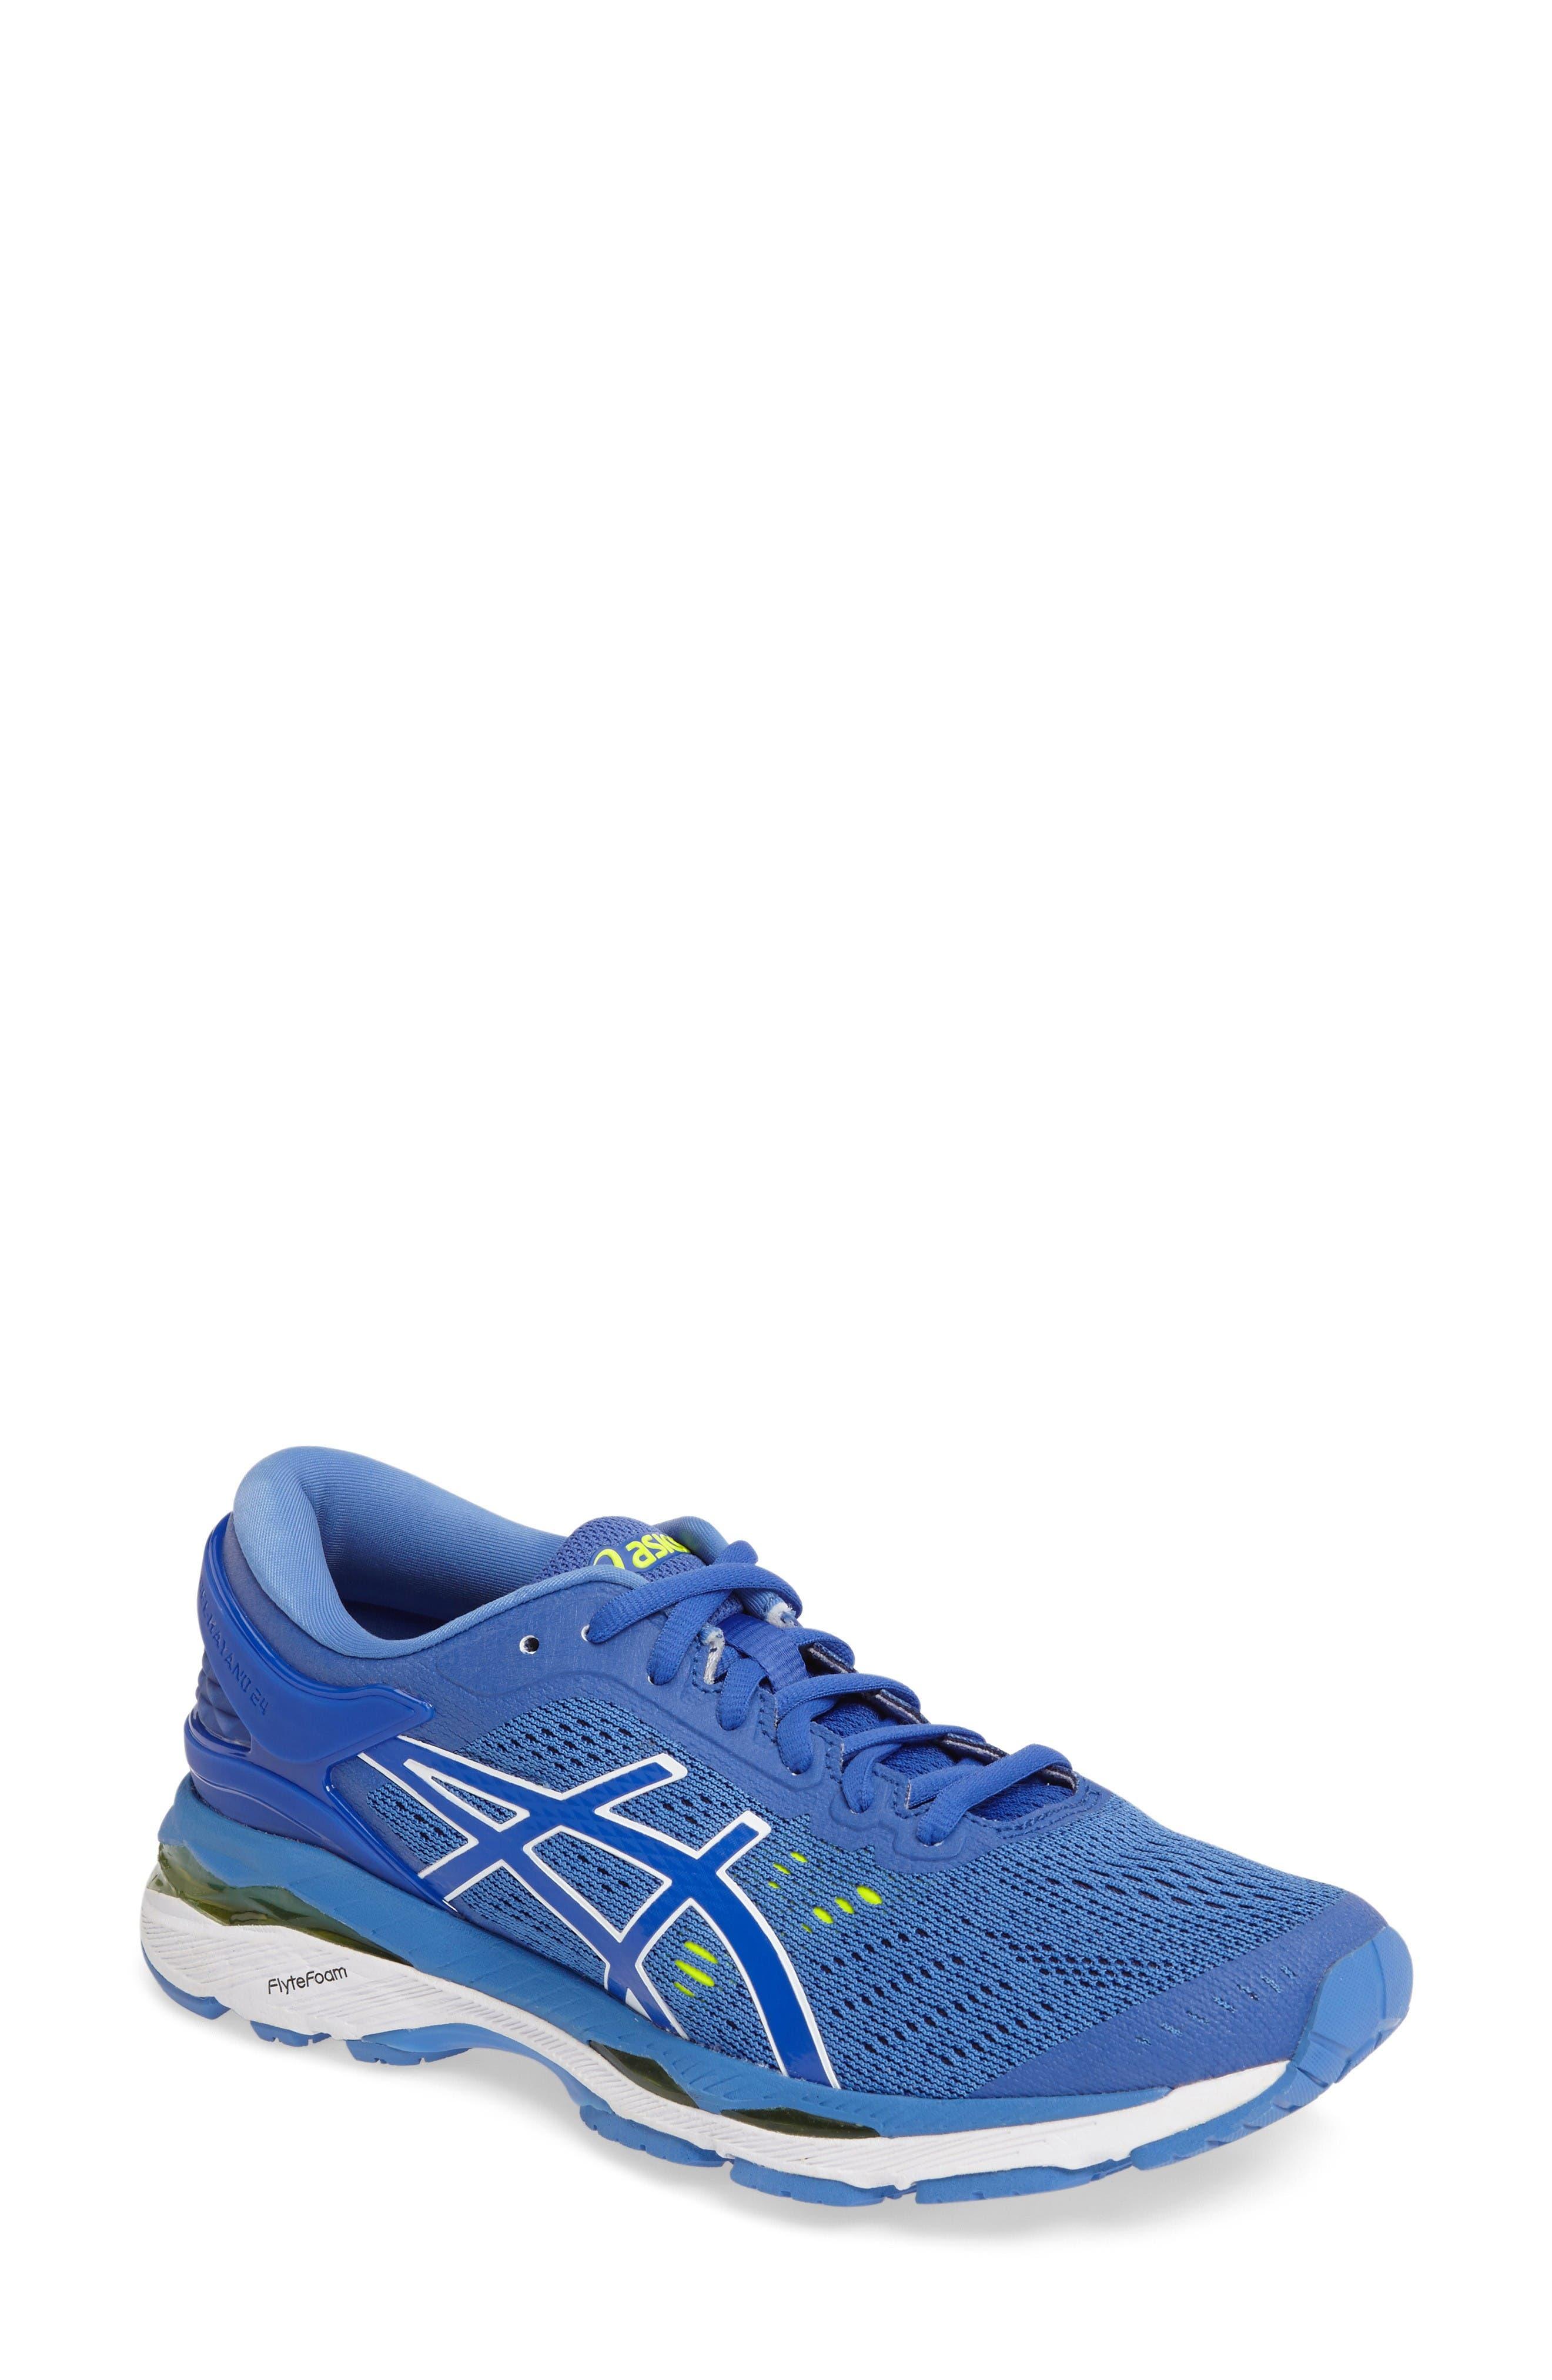 GEL-Kayano<sup>®</sup> 24 Running Shoe,                         Main,                         color, Blue Purple/ Regatta/ White